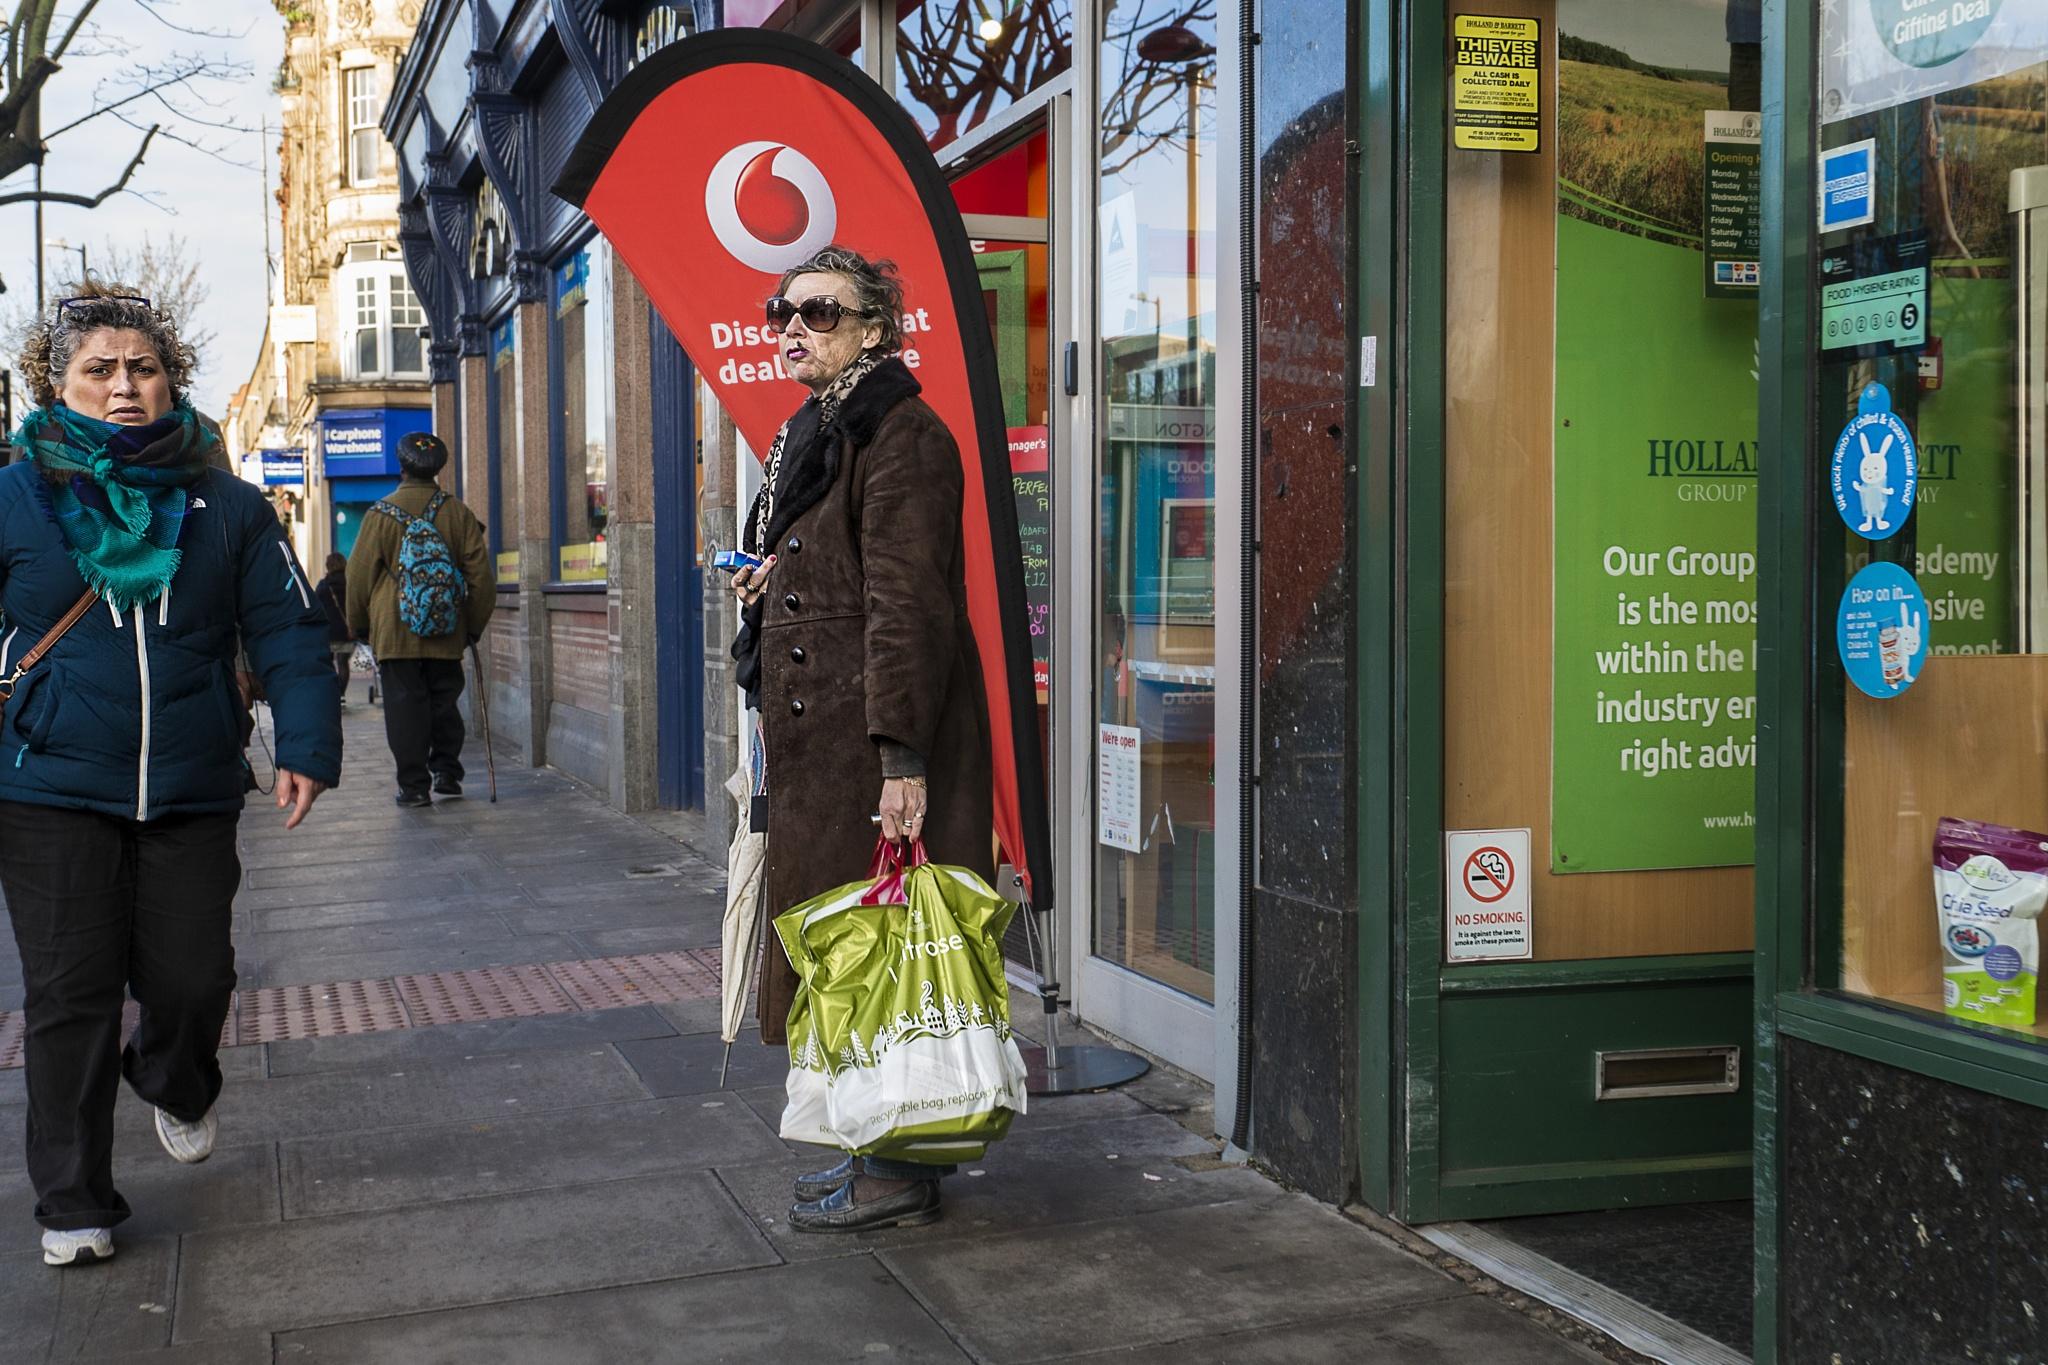 London's streets by Darek Baranowski